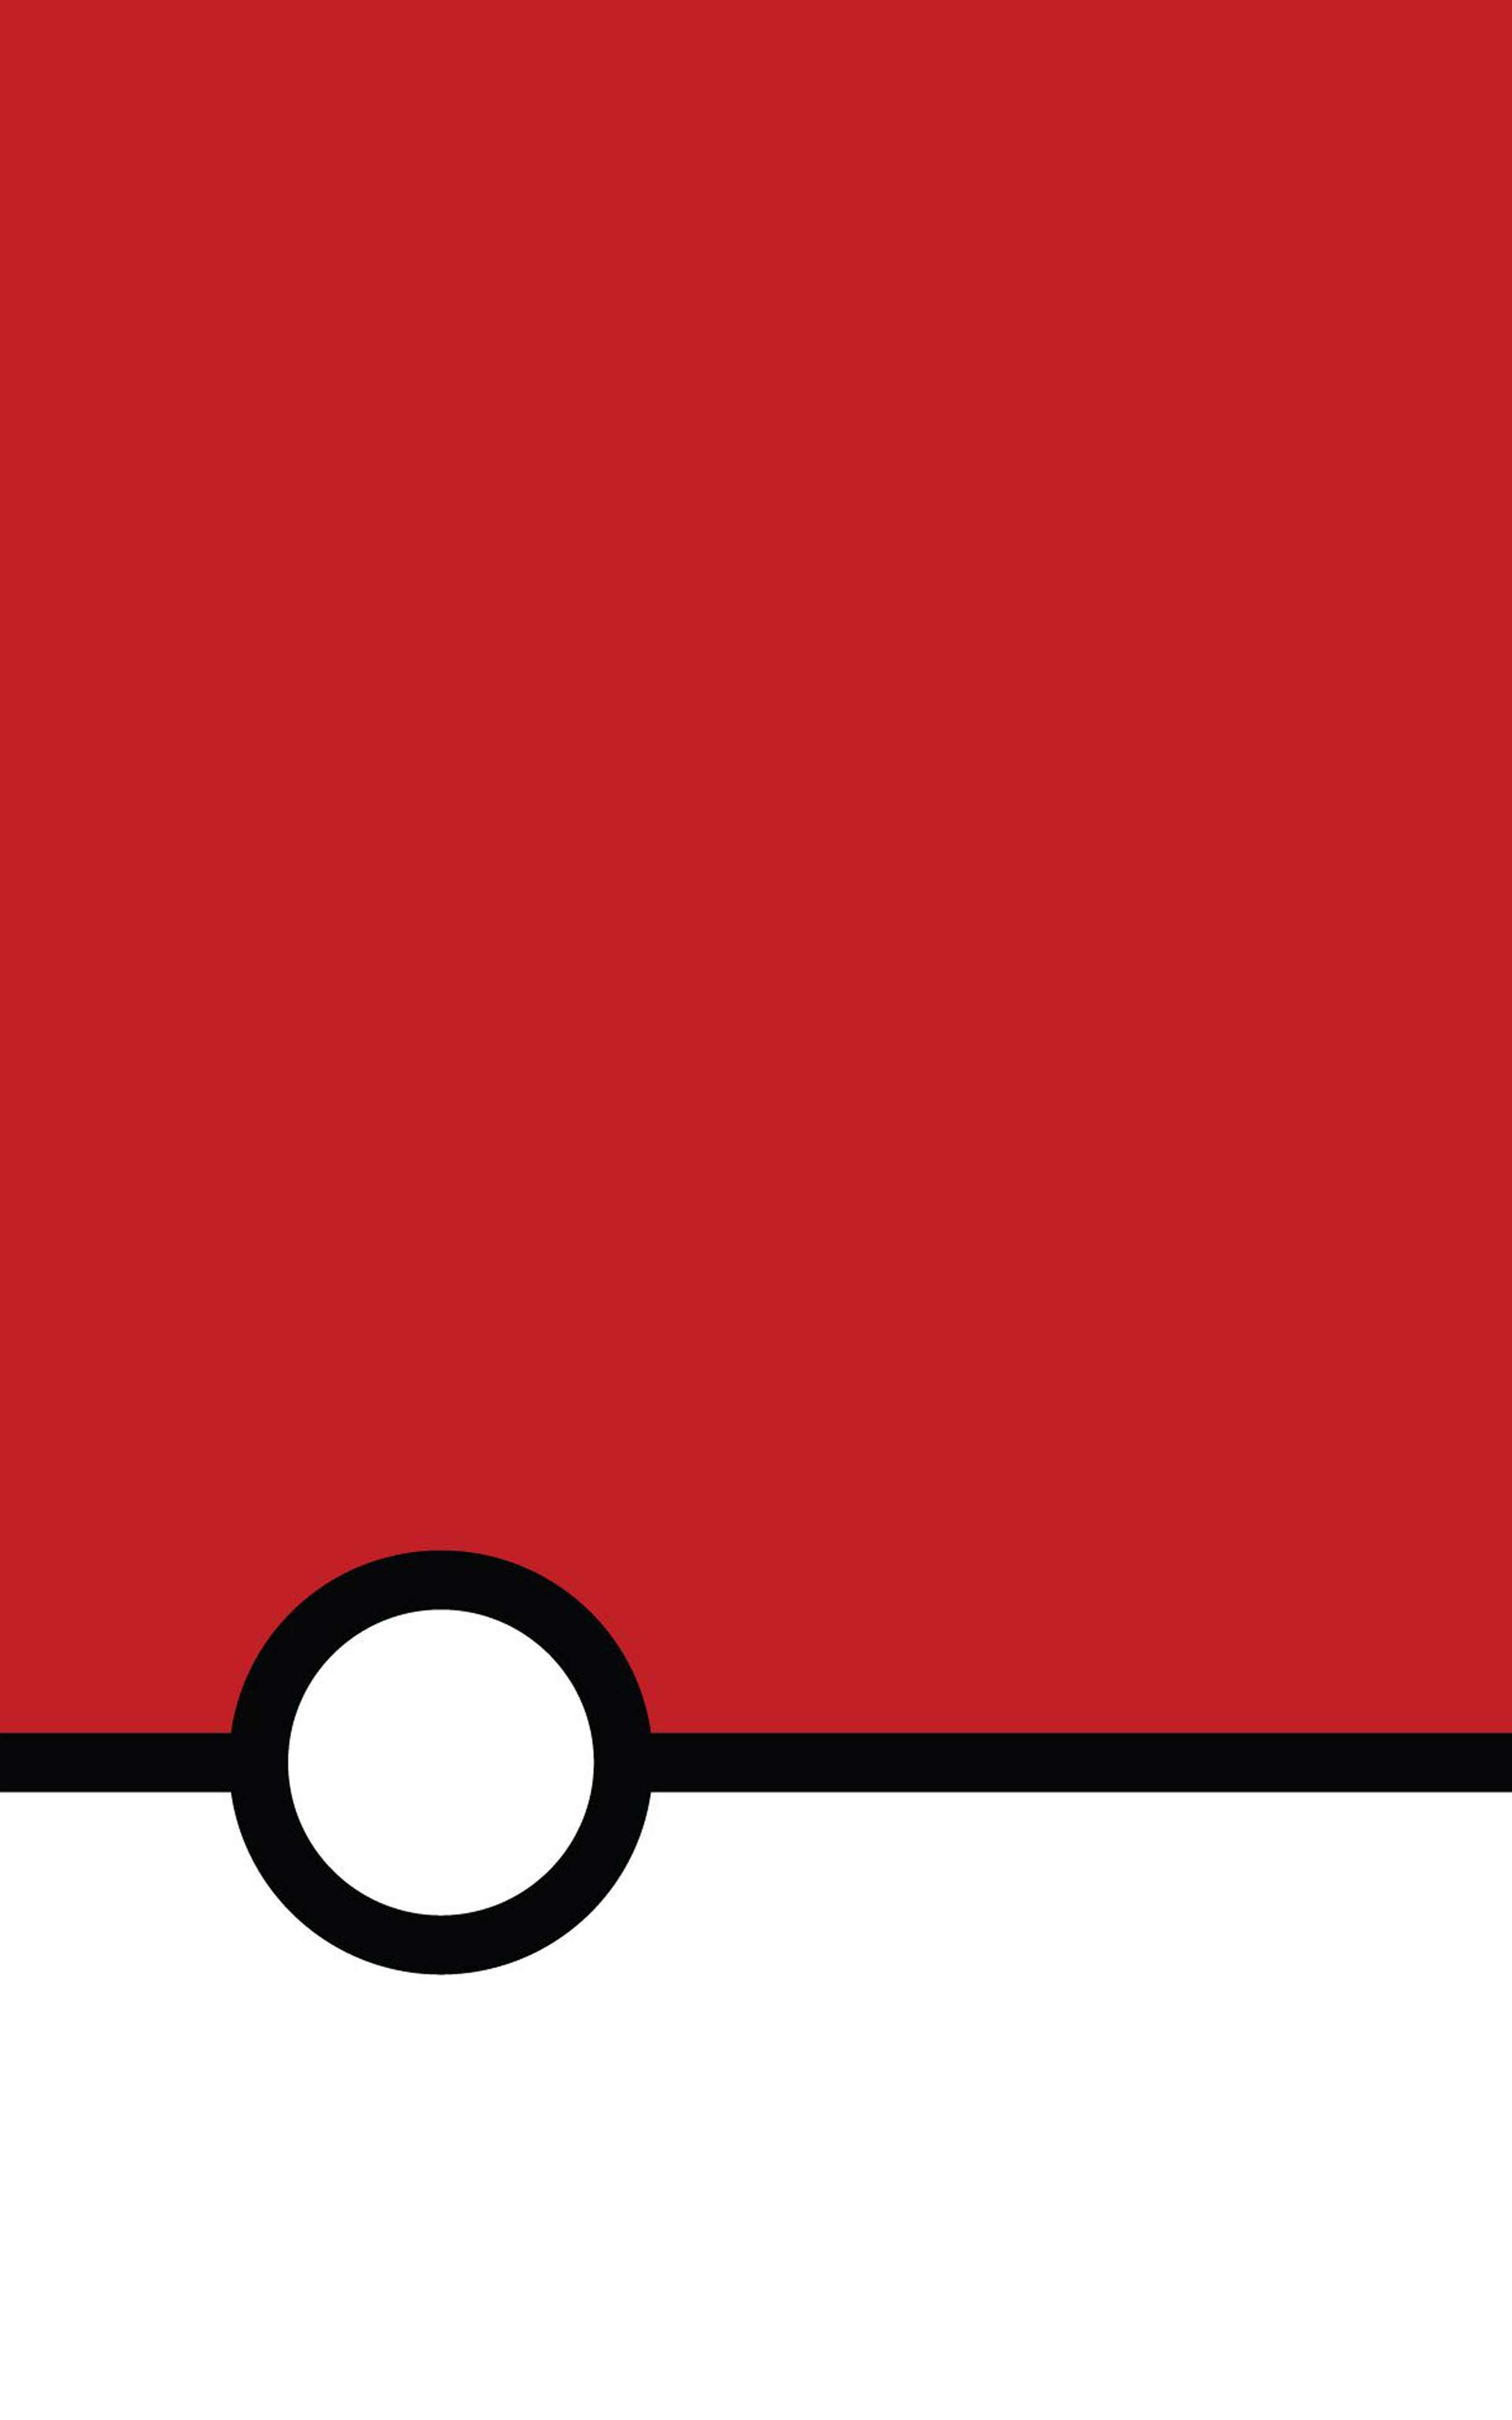 Simple Wallpaper Mobile Pokemon - pokemon-go-pokeball-mobile-wallpaper-minimalist-2400x3840  Best Photo Reference_784129.jpg